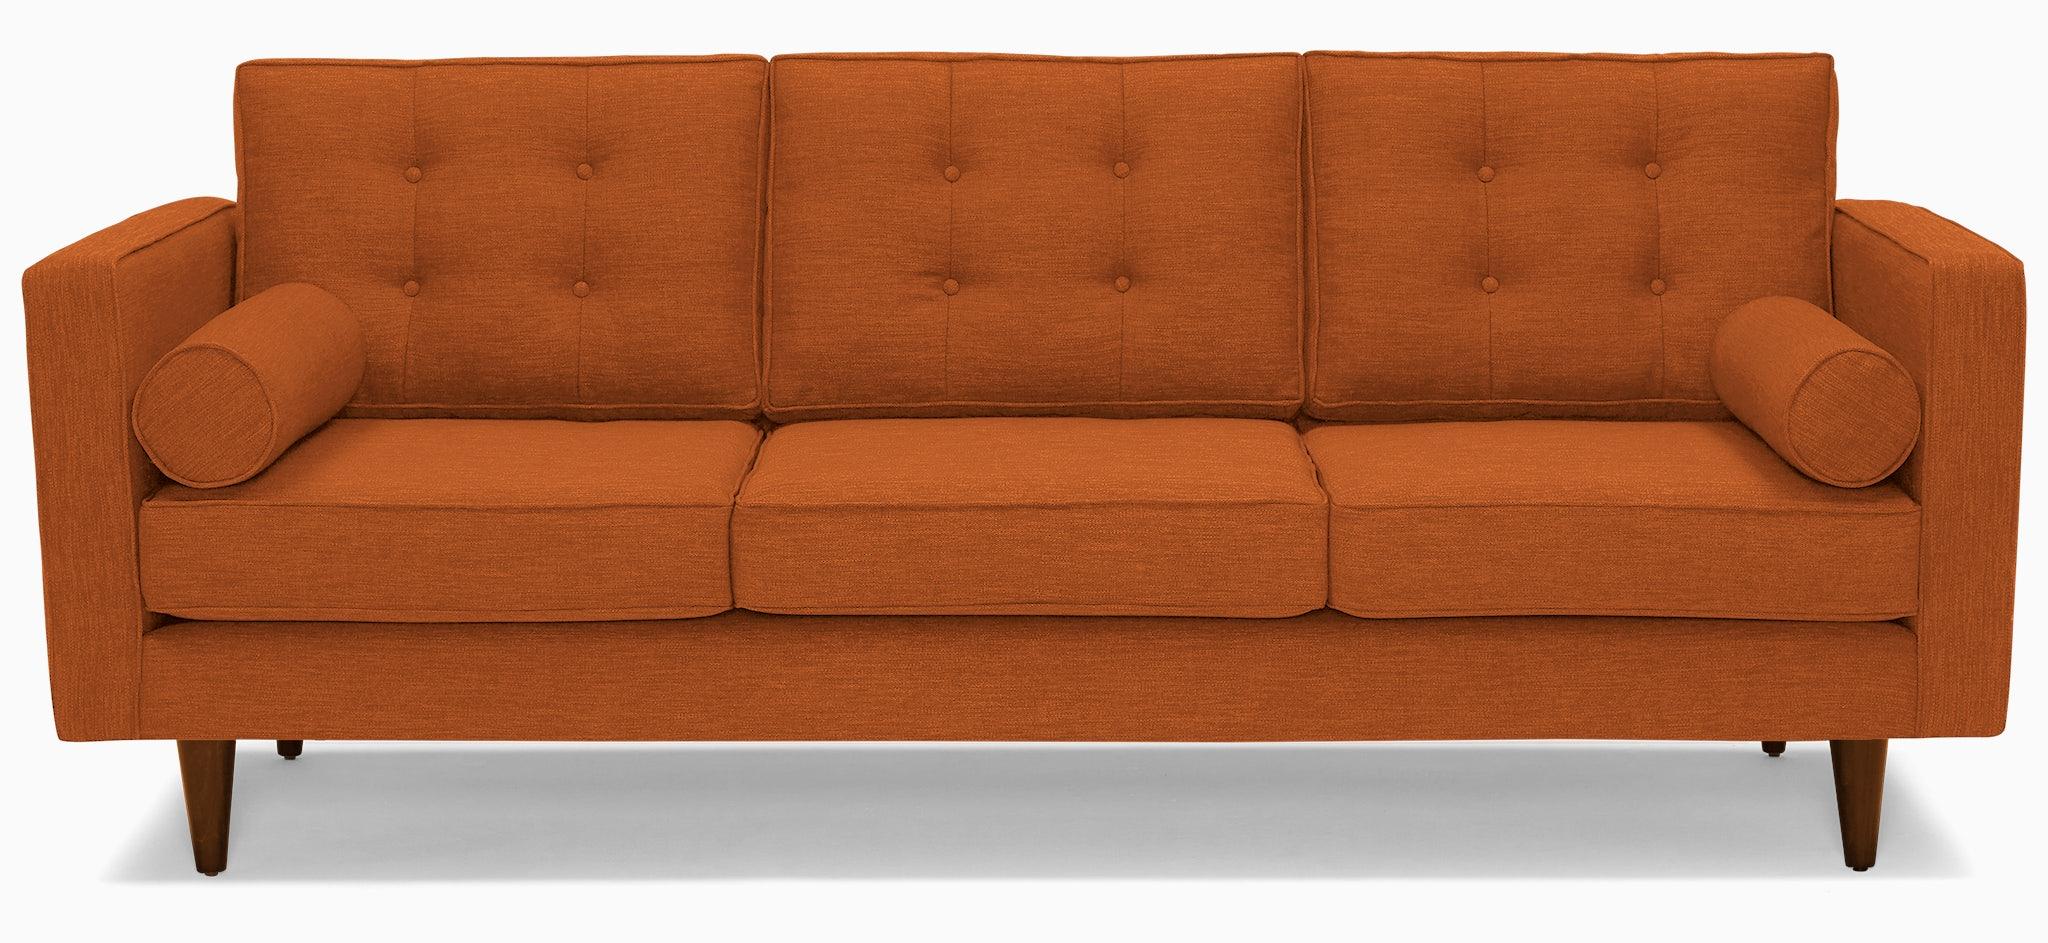 braxton sofa vibe sunkist